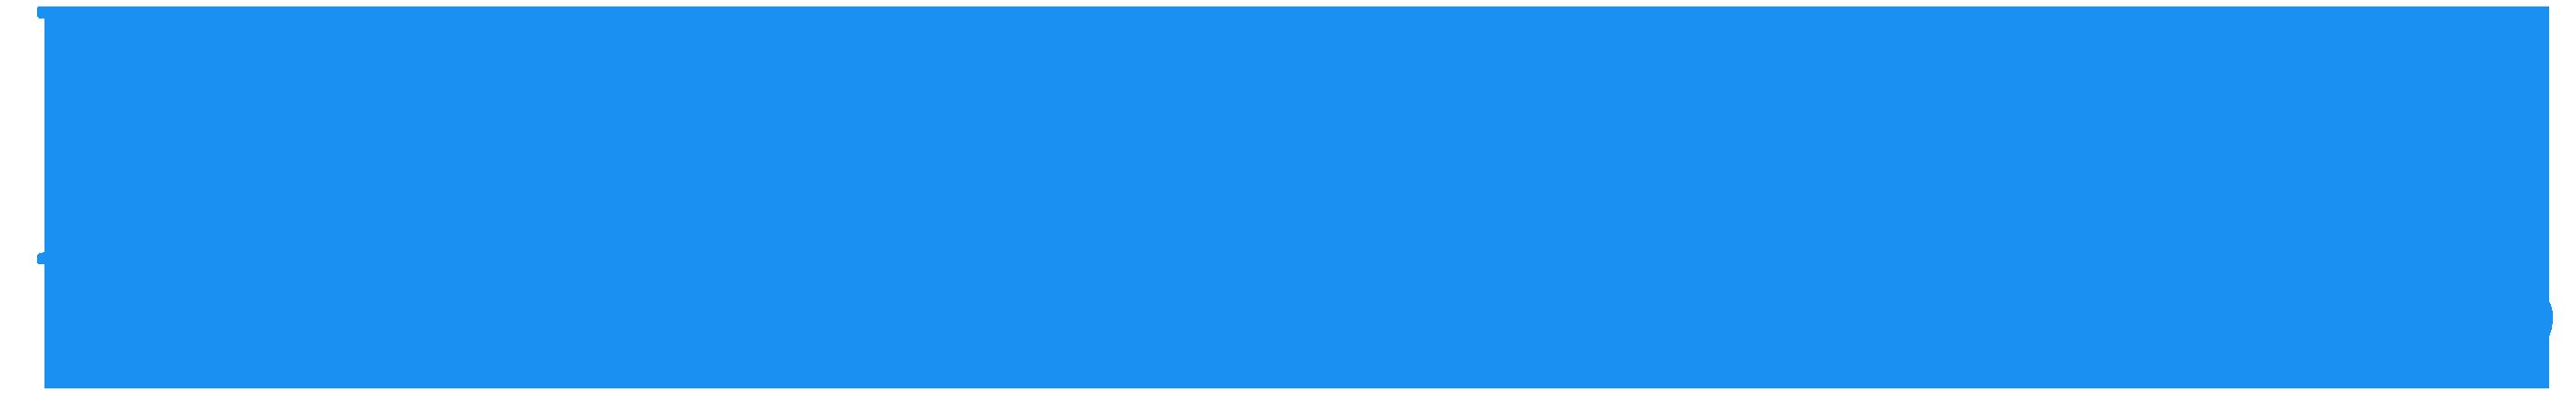 lf-recruiting-logo-blue